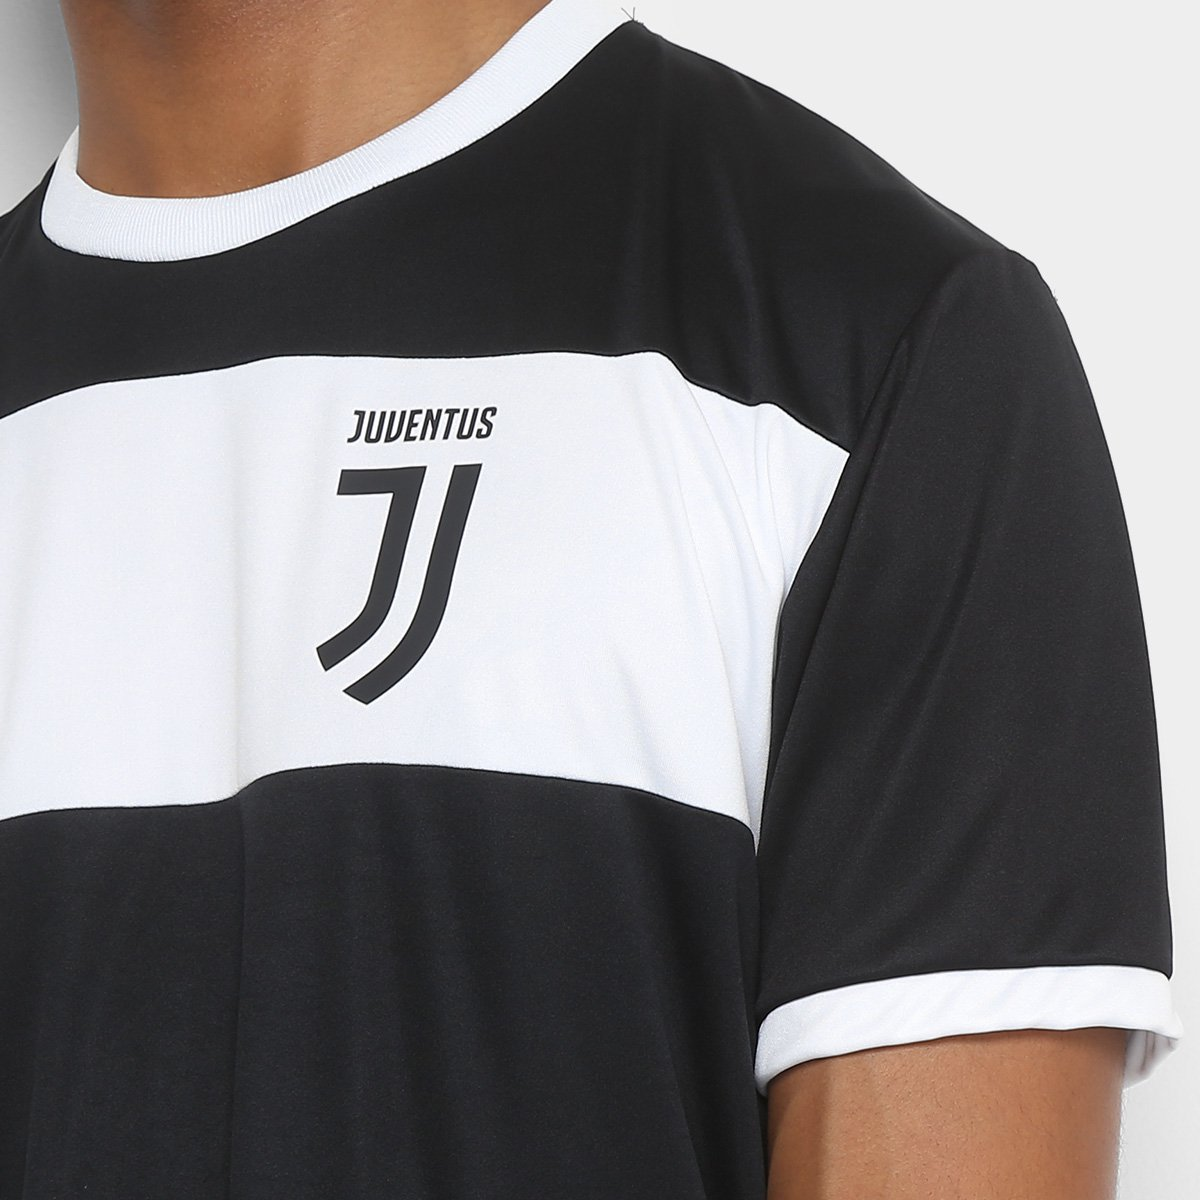 35a9dcdc94 ... Camiseta Juventus Dry Masculina. Camiseta Juventus Dry Masculina - Preto +Branco